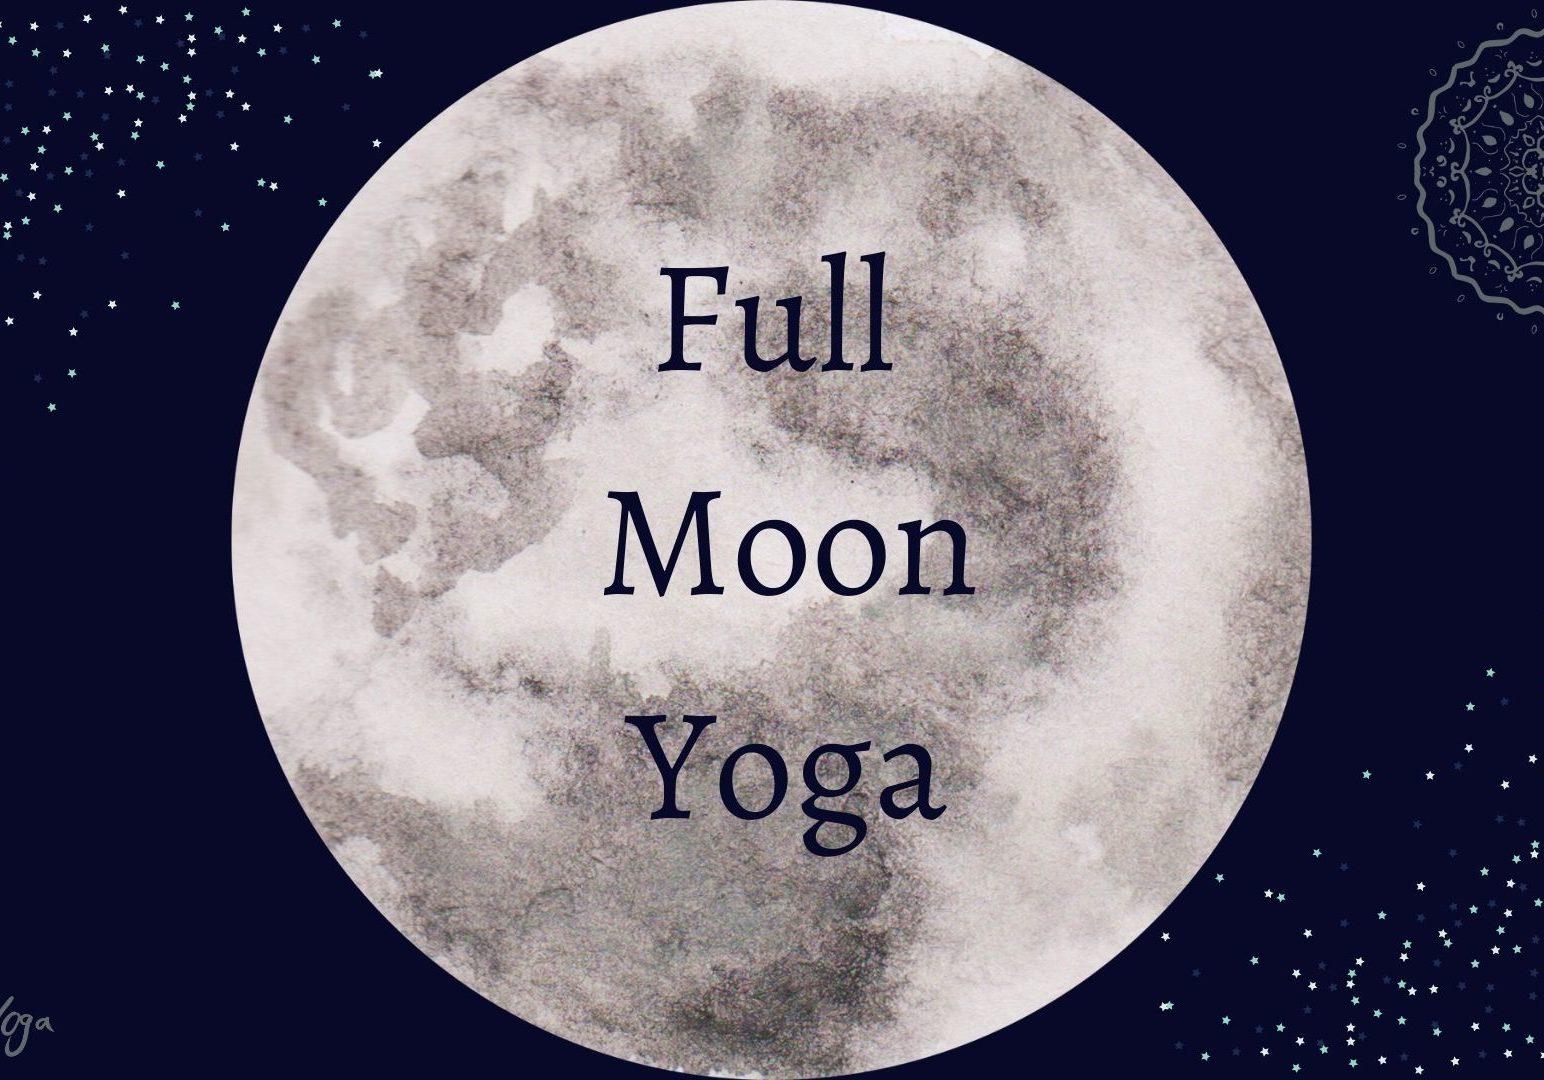 Full-Moon-Yoga-facebook-event.jpg